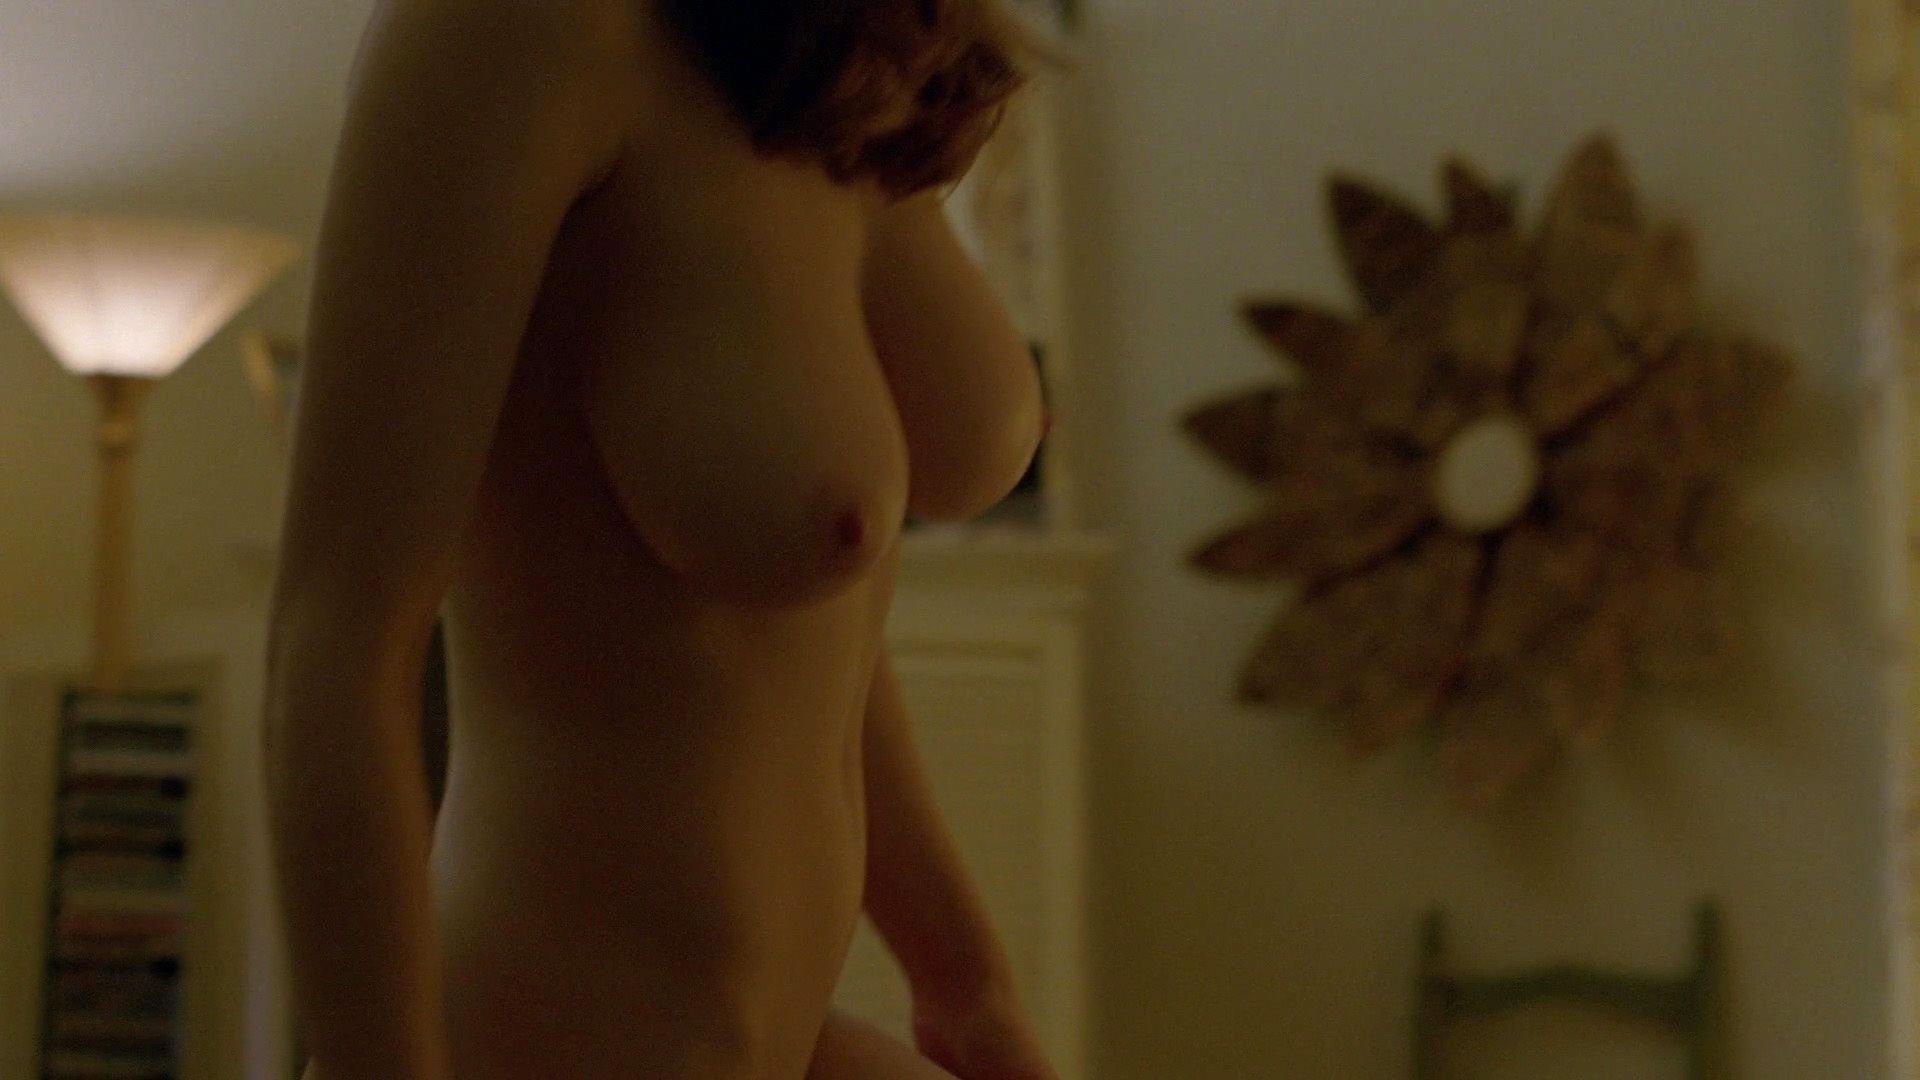 Very hot naked italian girls